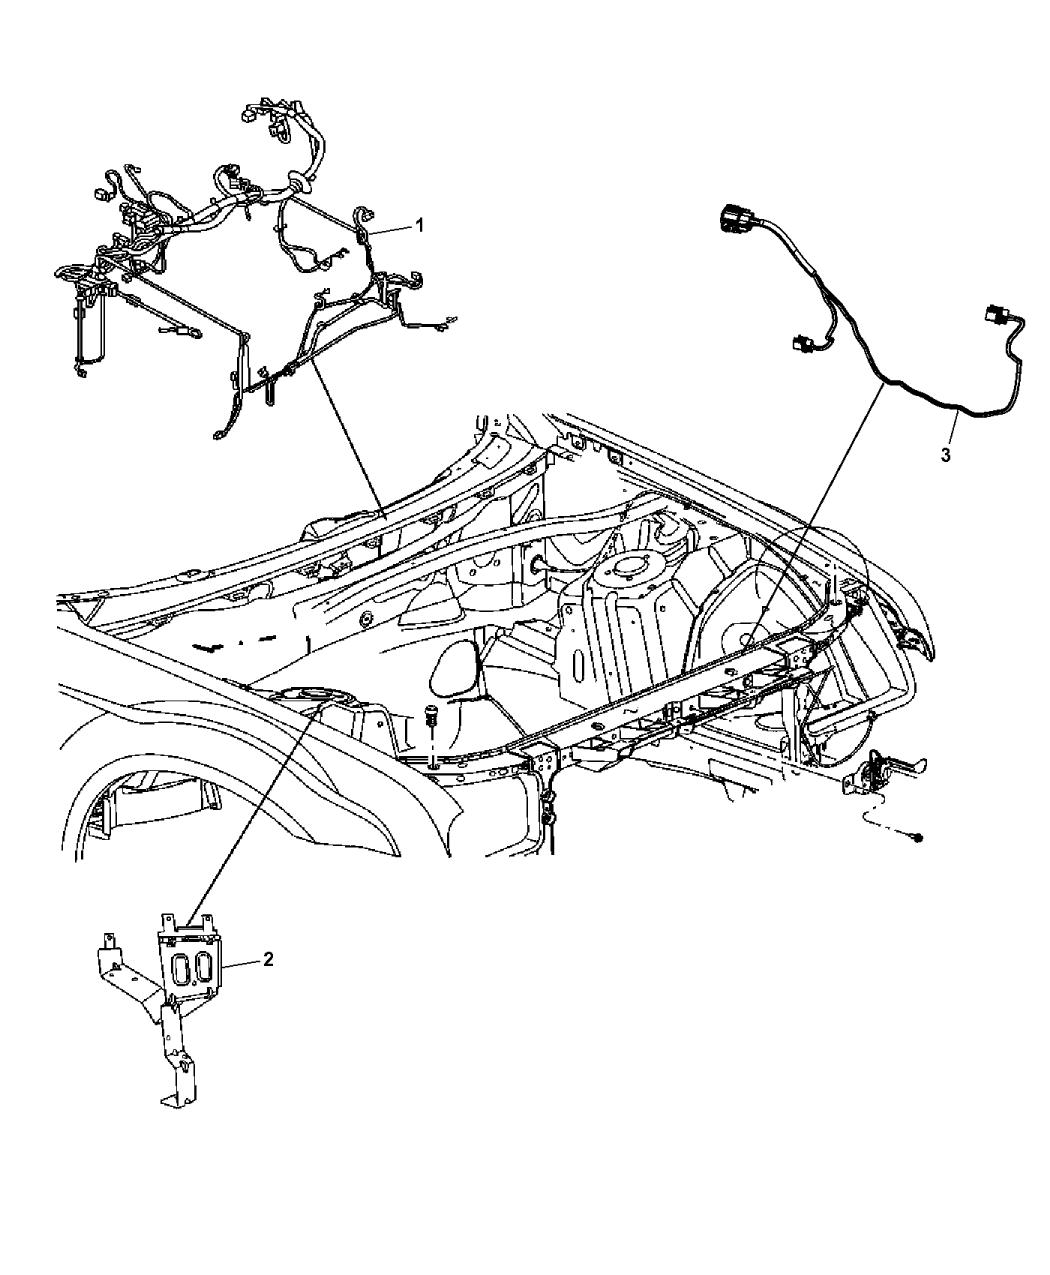 68202713ab Genuine Mopar Headlamp To Dash 2014 Dodge Charger Wiring Diagram